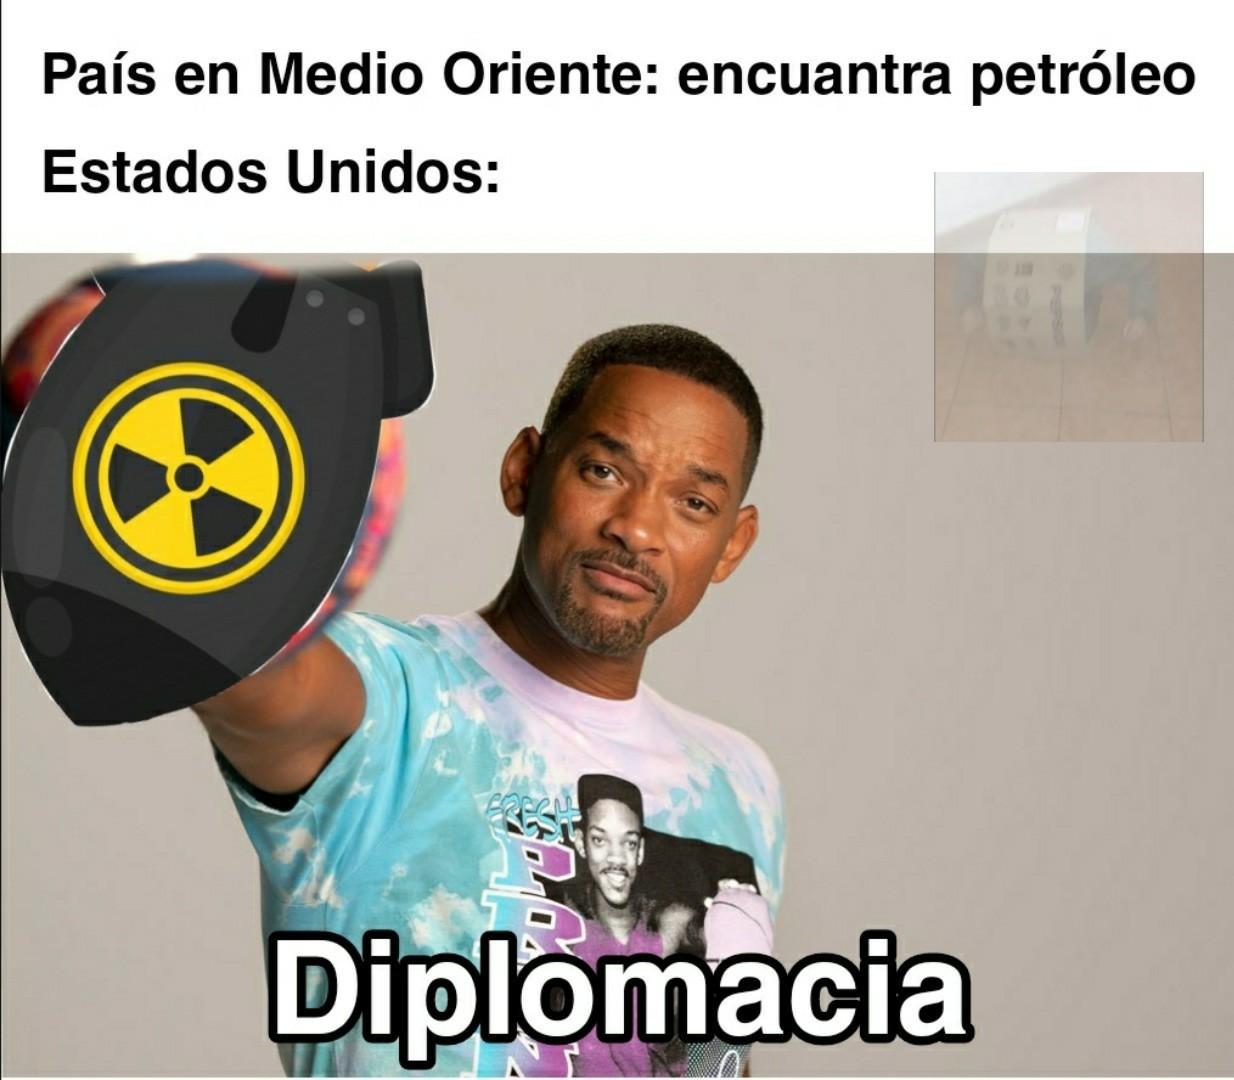 Huele a diplomacia - meme